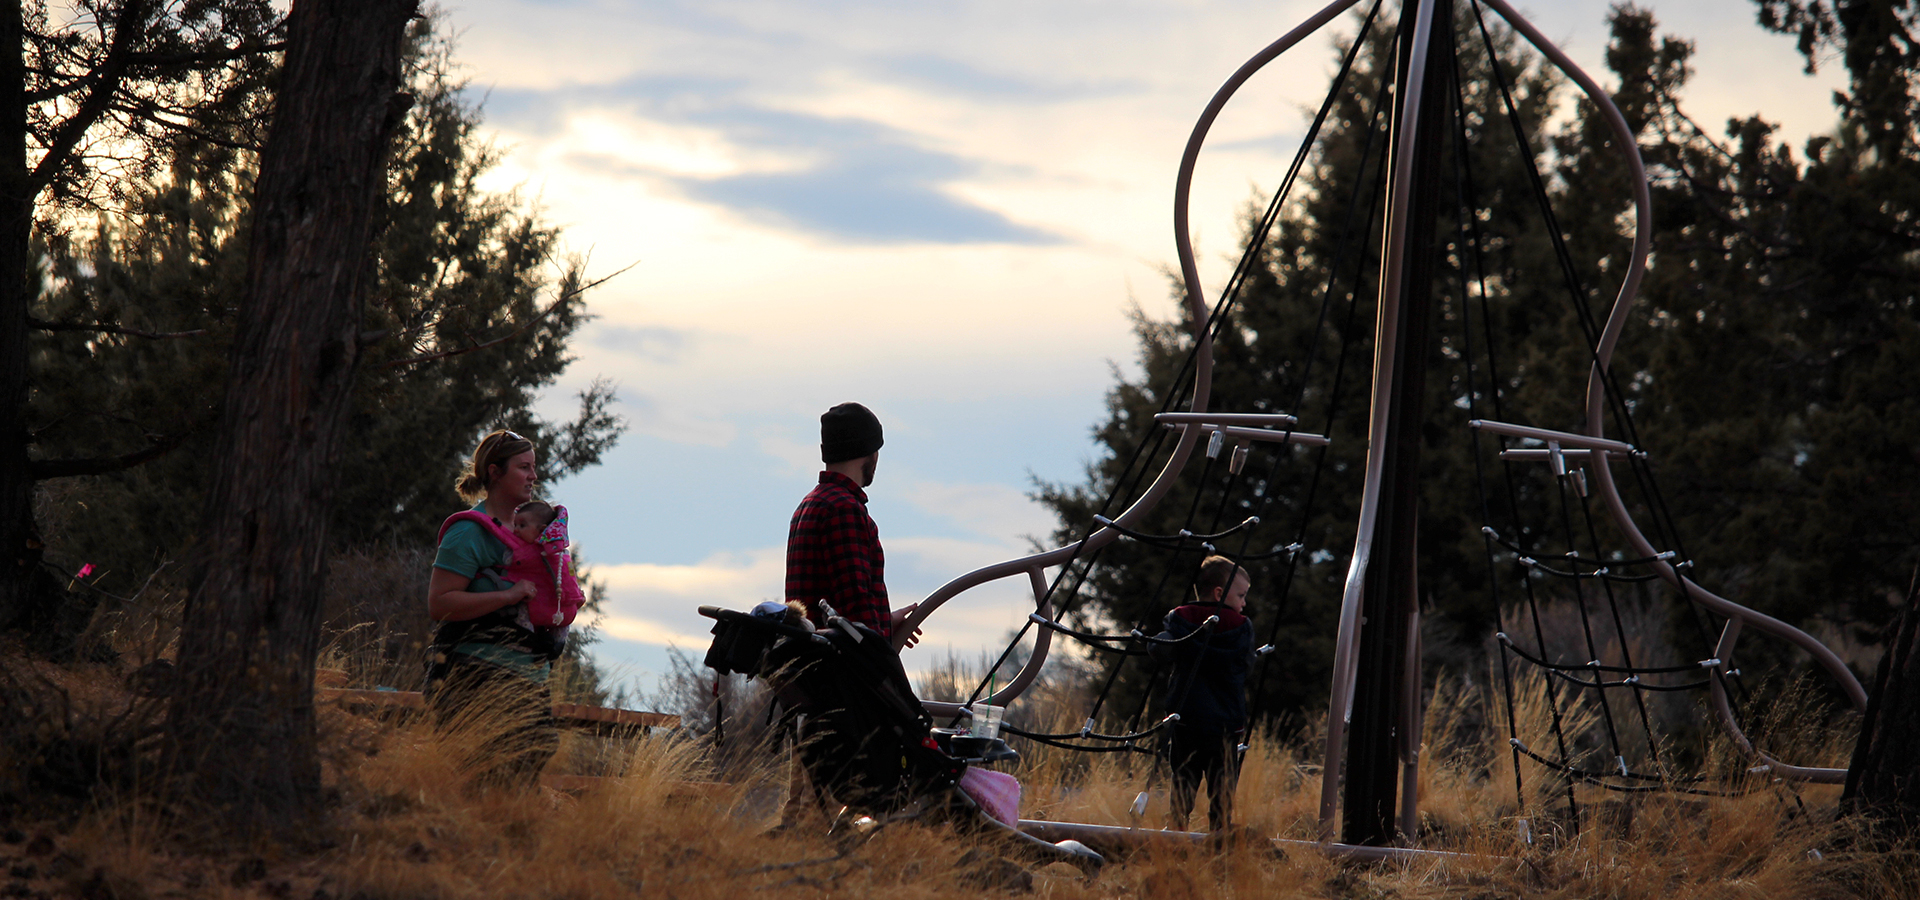 Stone-Creek-Park-Playground